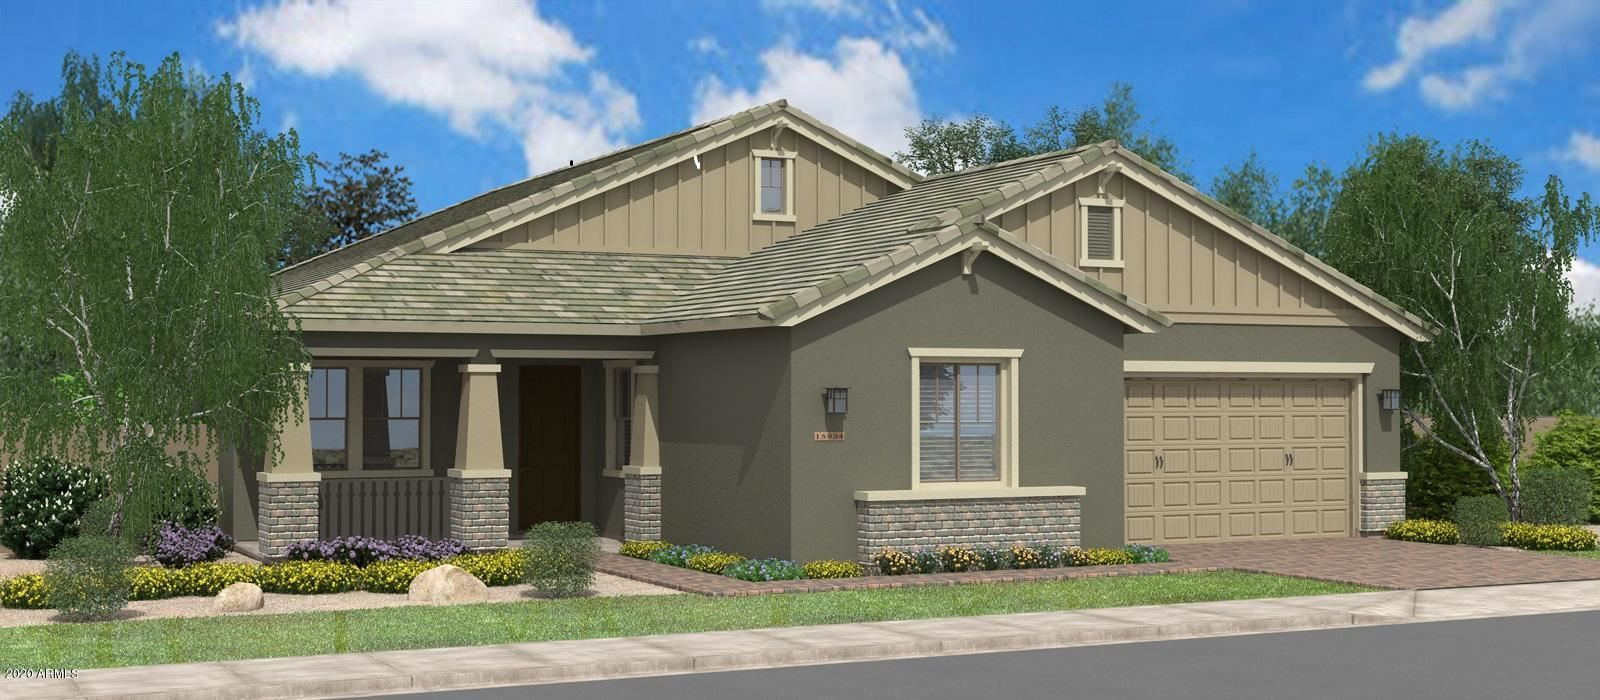 Photo for 41563 W BARCELONA Drive, Maricopa, AZ 85138 (MLS # 6154700)